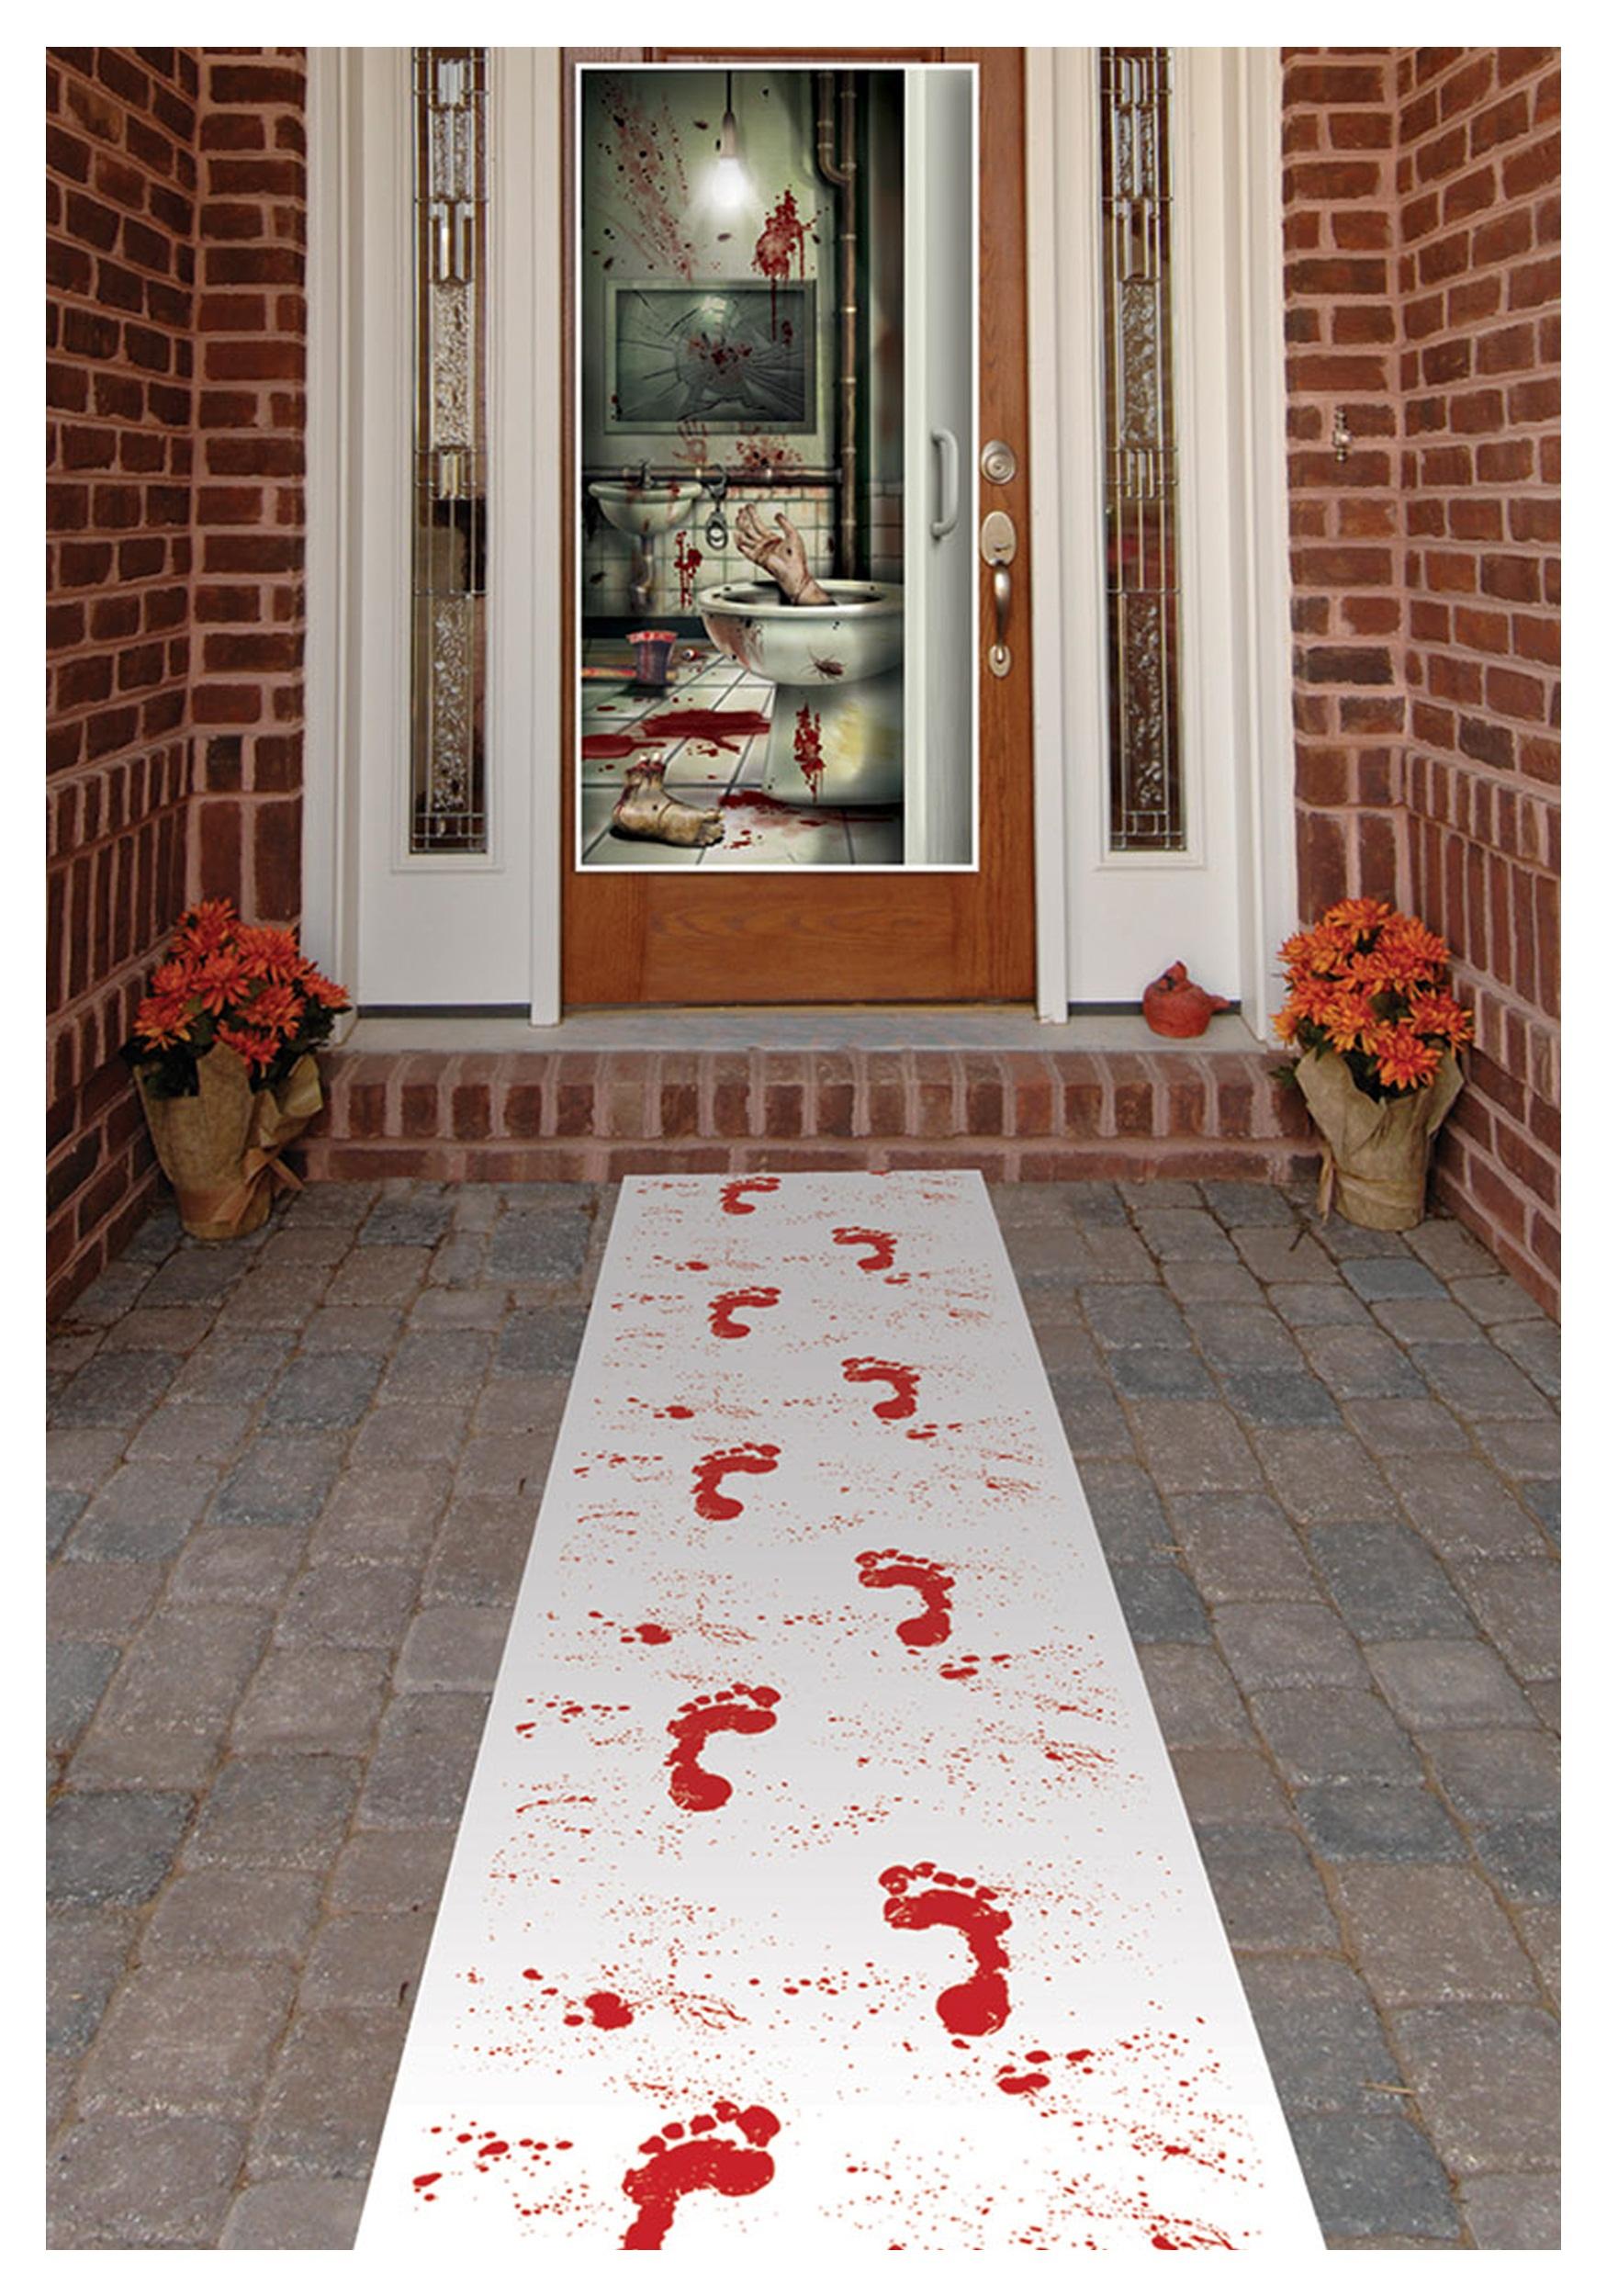 Bloody_Footprints_Halloween_Decoration_Runner